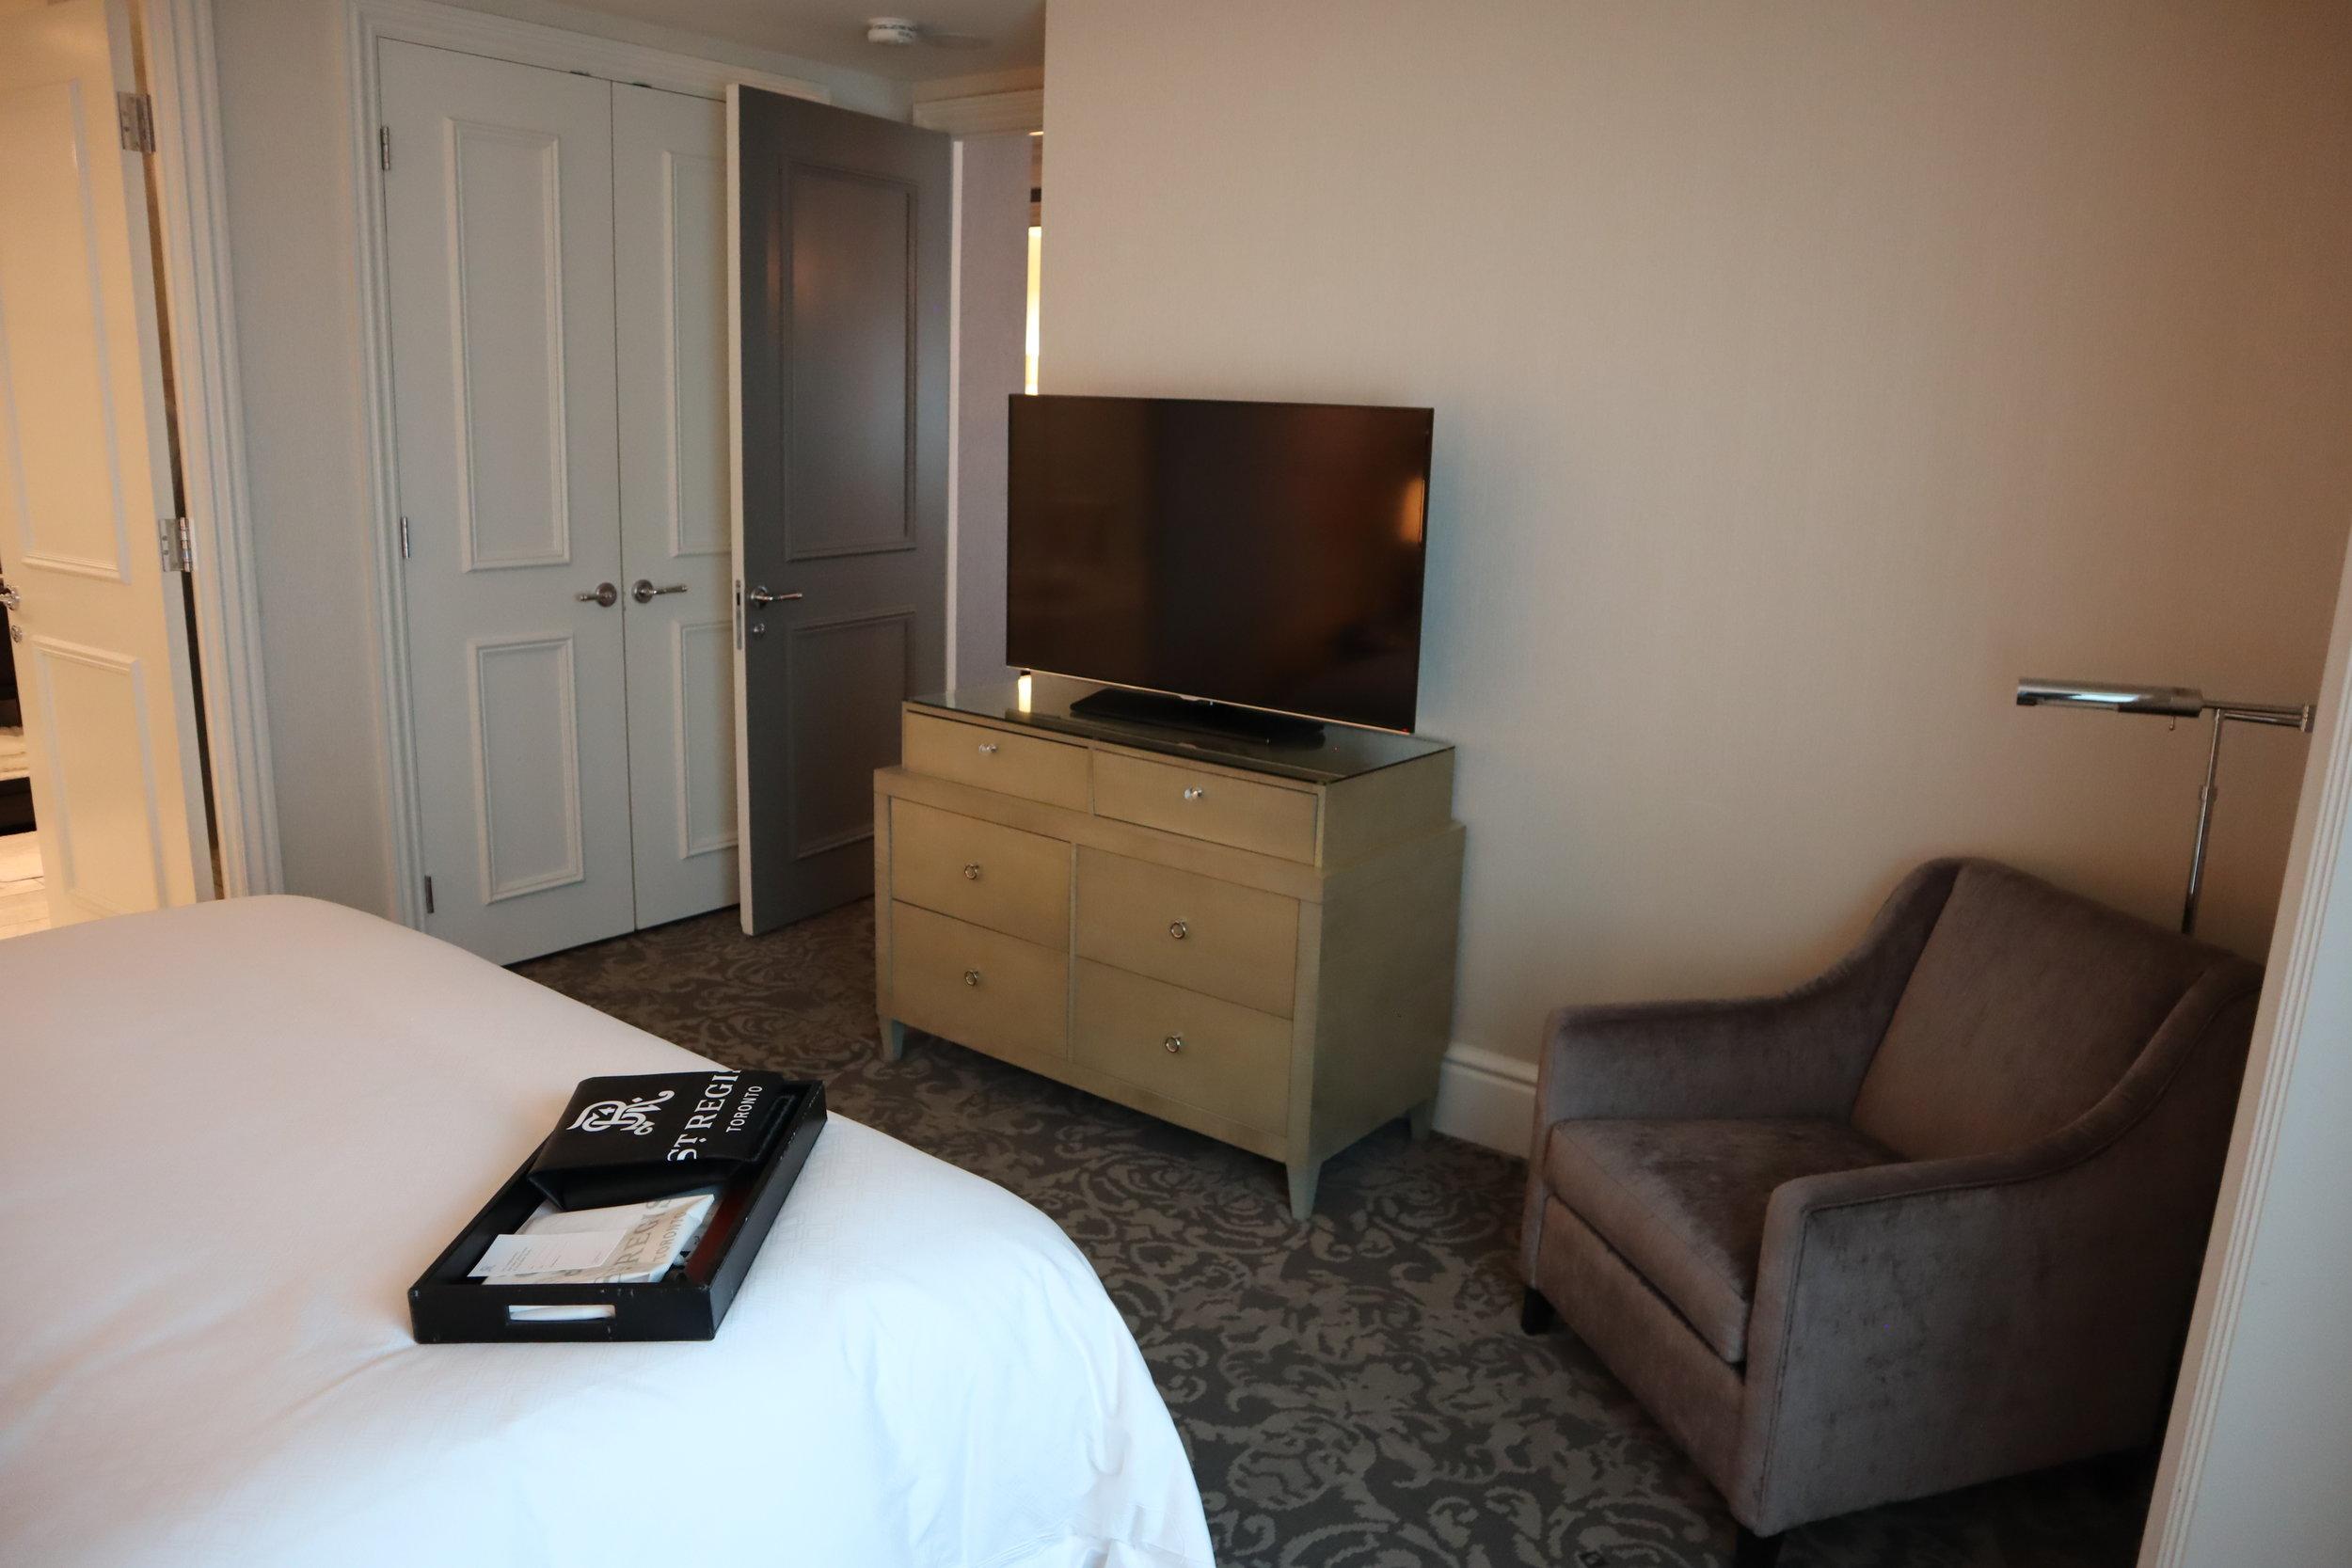 St. Regis Toronto – Two-bedroom suite master bedroom furniture